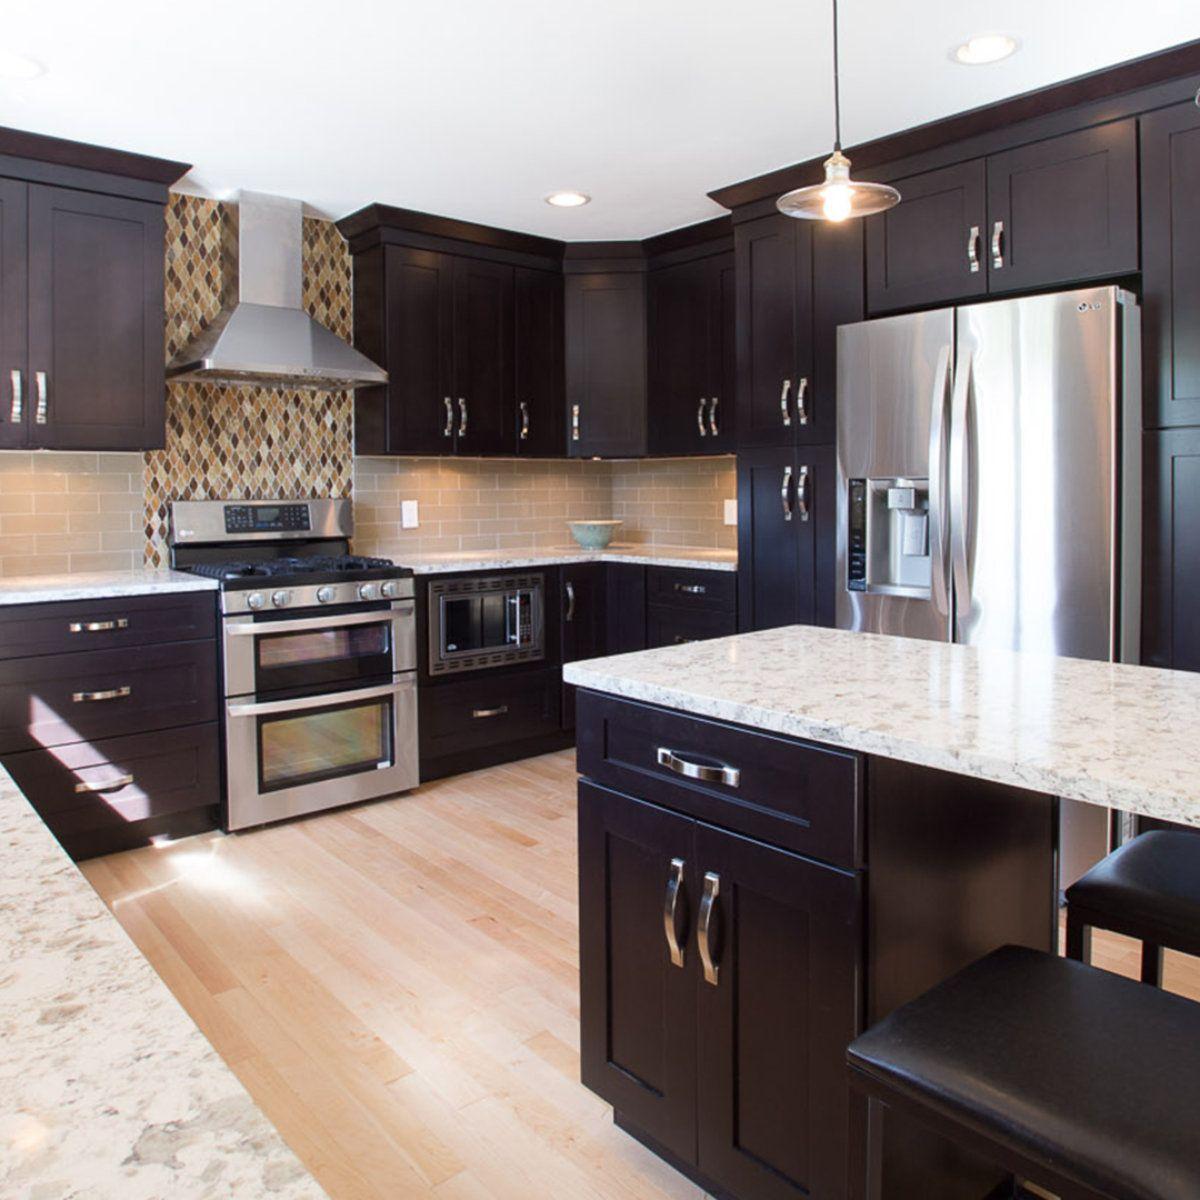 Forevermark Cabinets Pepper Shaker Kitchen Cabinet